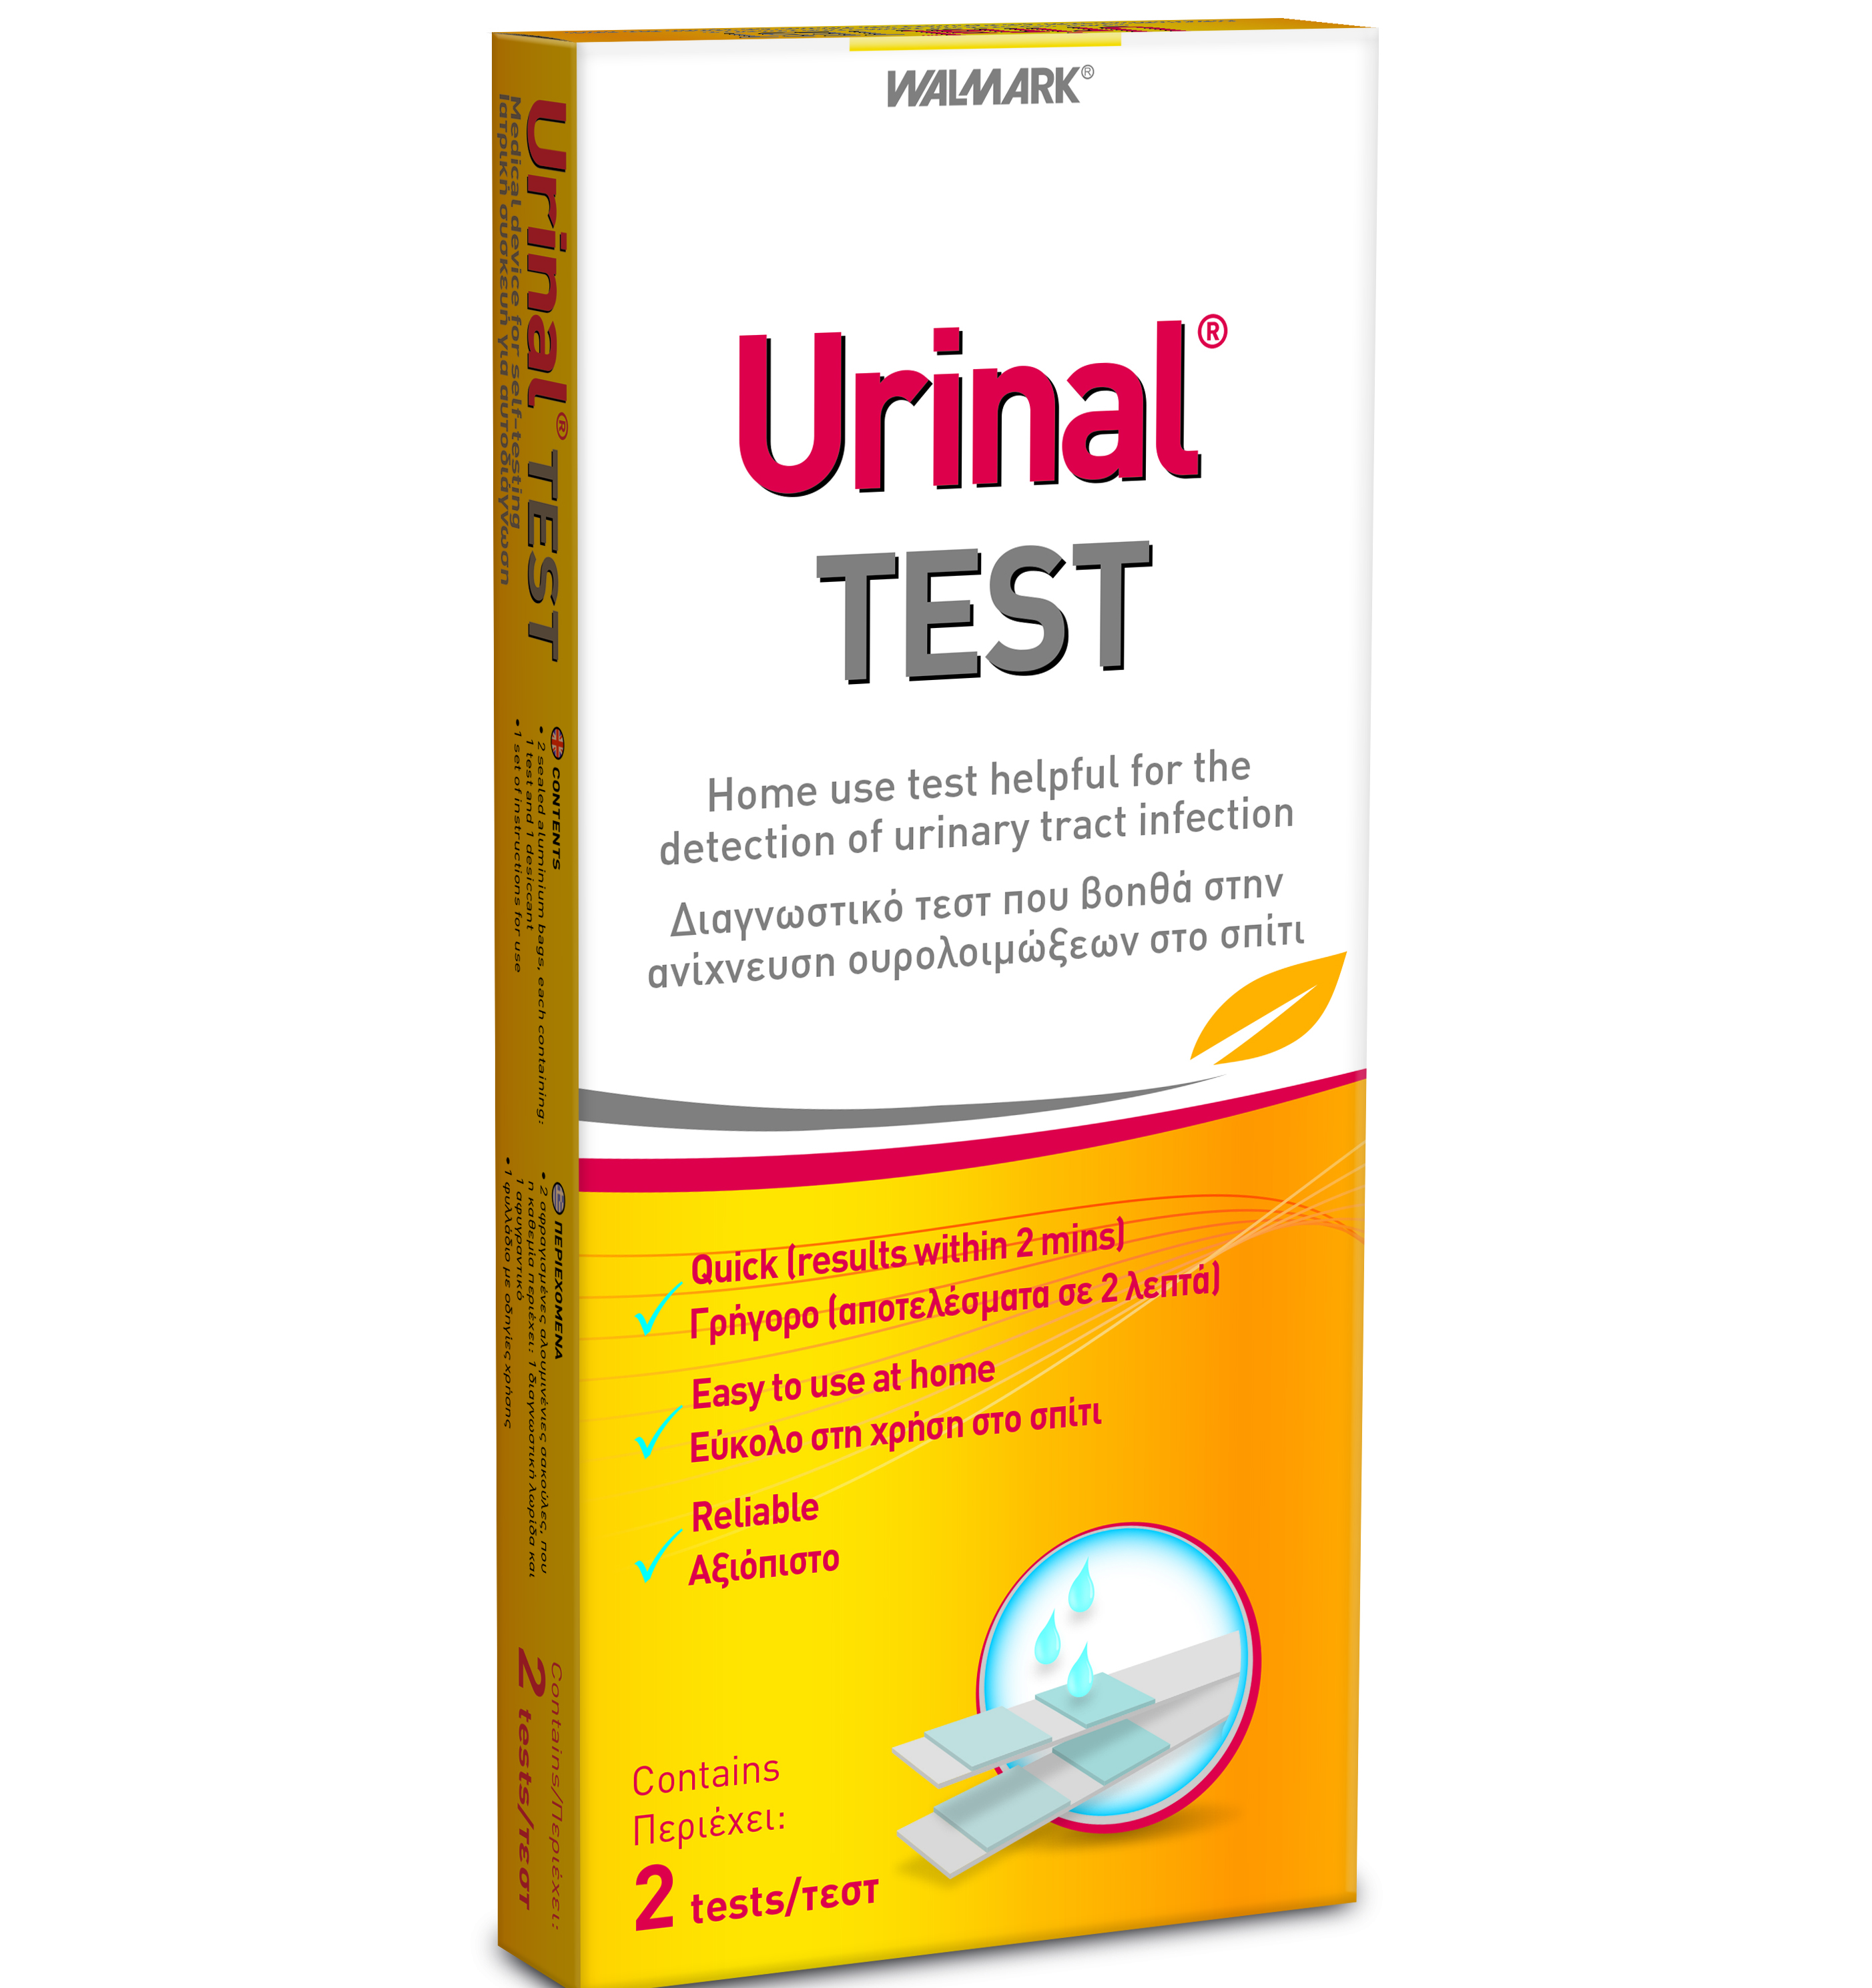 Vivapharm Urinal Test Διαγνωστικό Τεστ Ουρολοιμόξεων, 2 tests